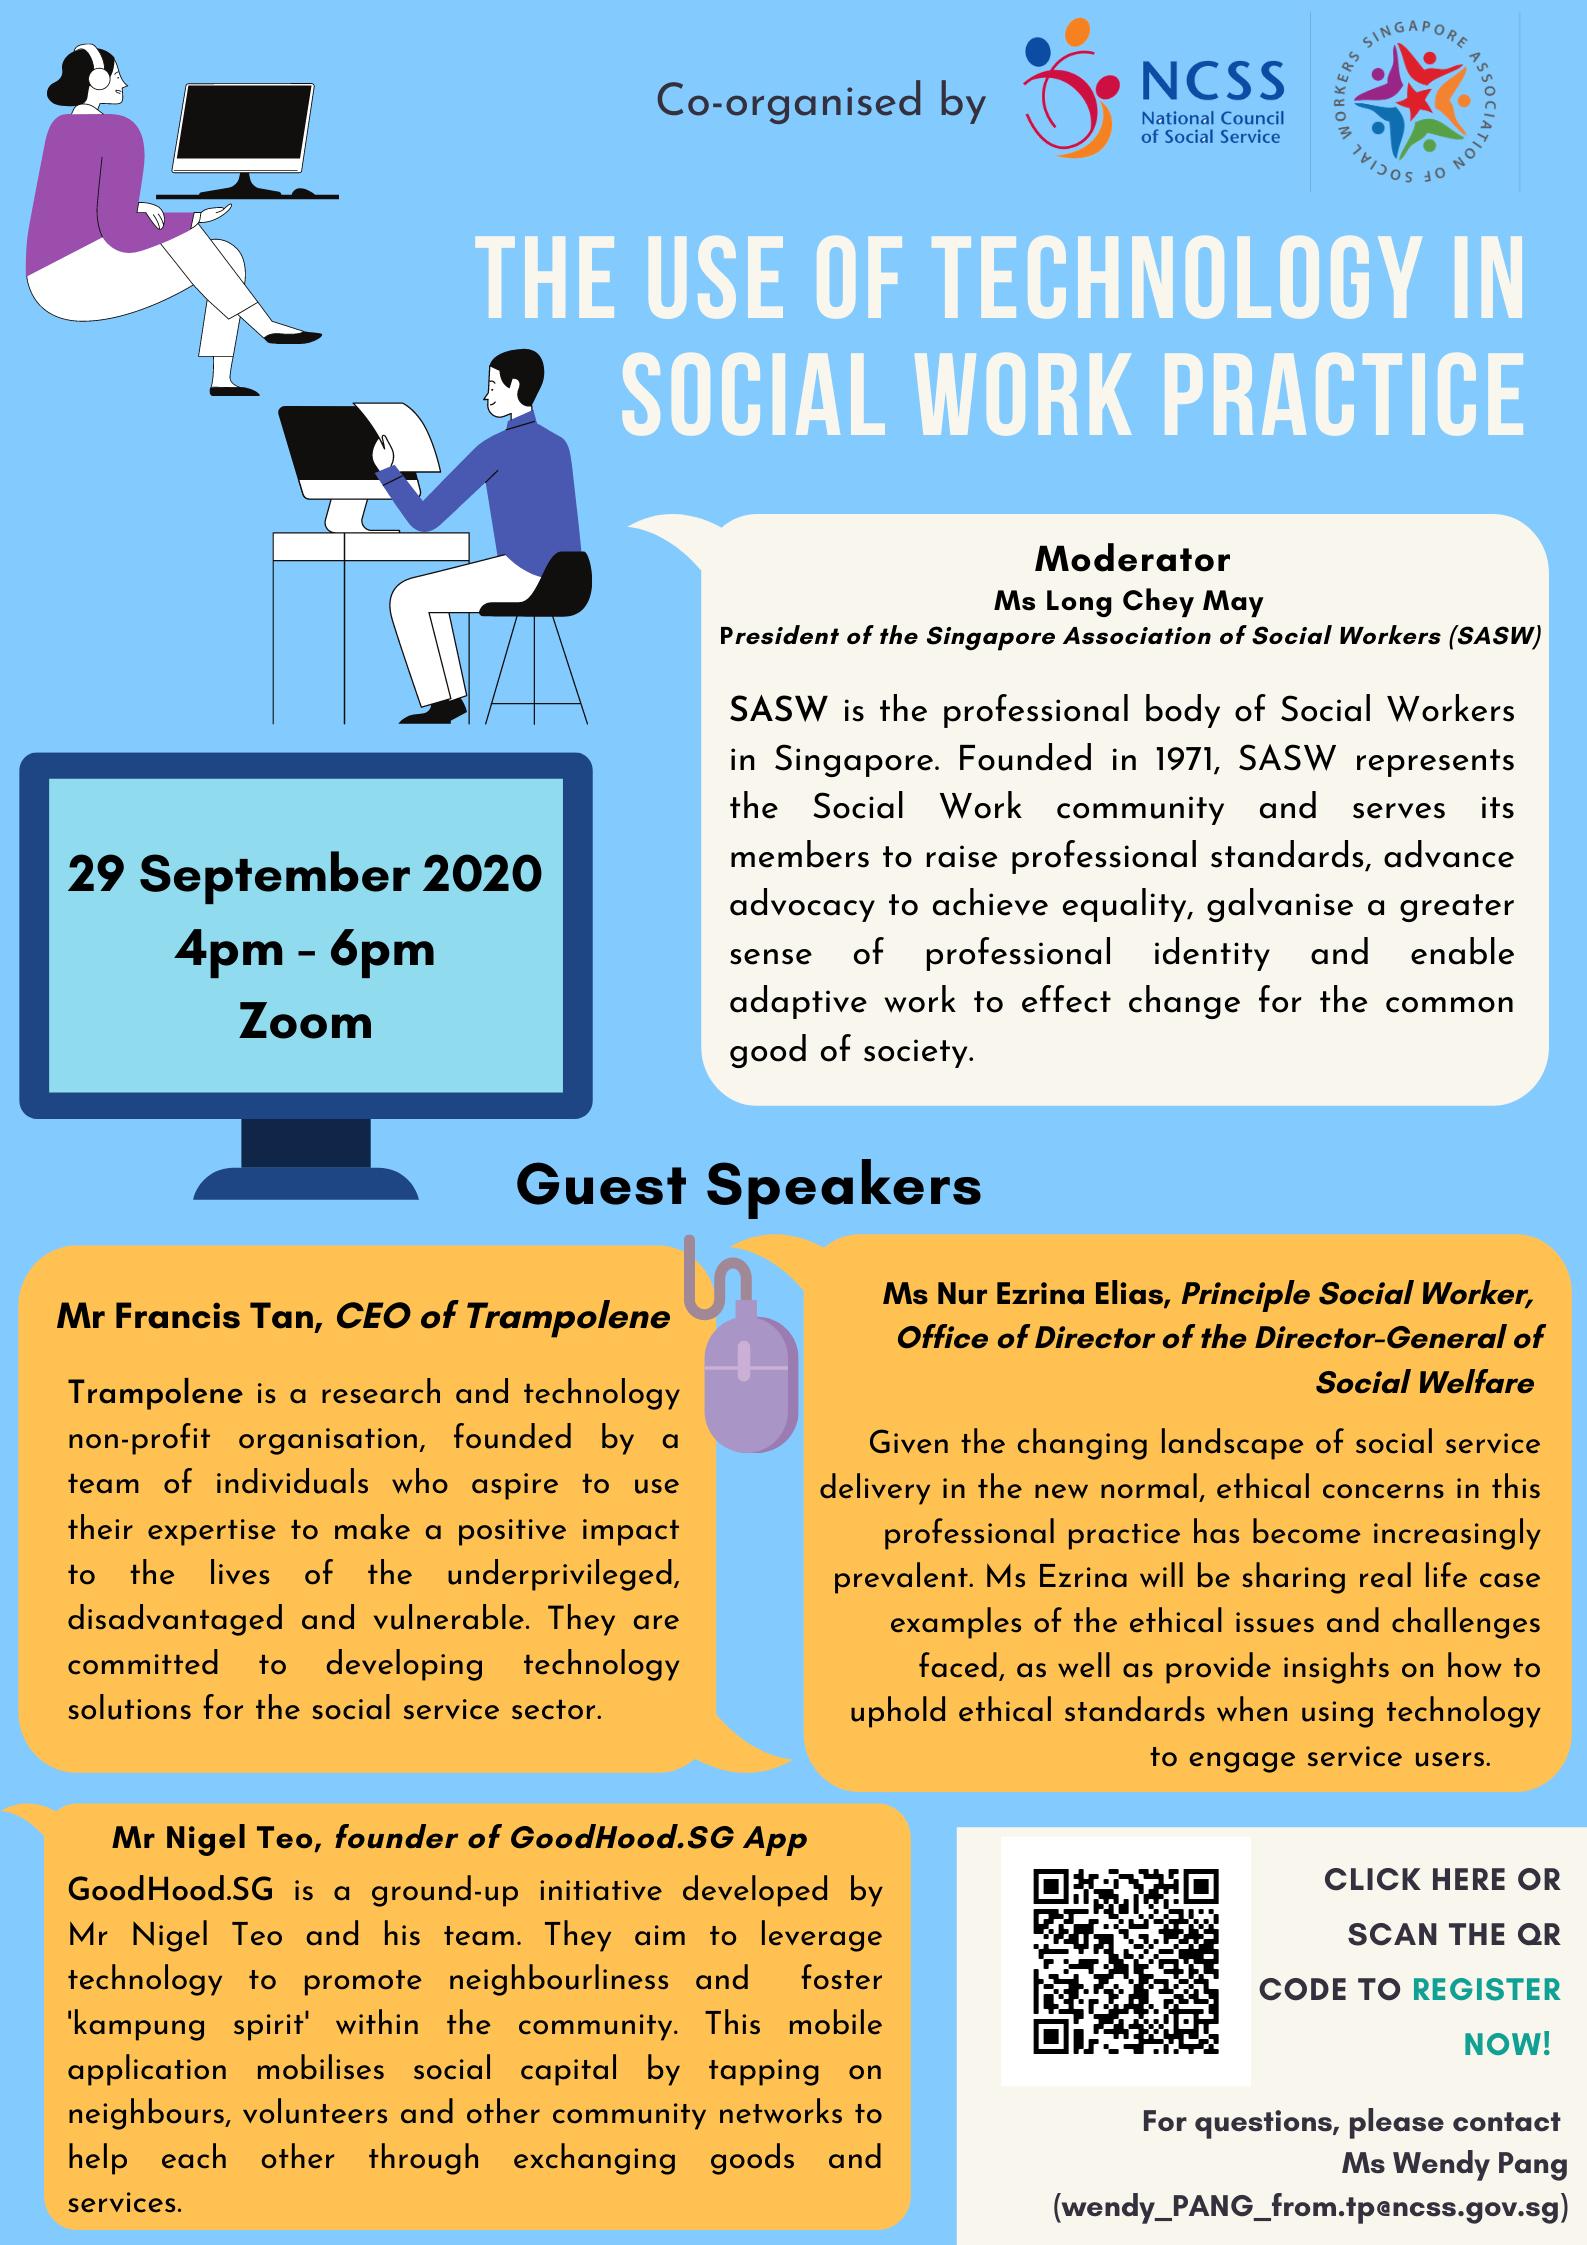 [Webinar] Digitalisation: Applications for Social Work Practice